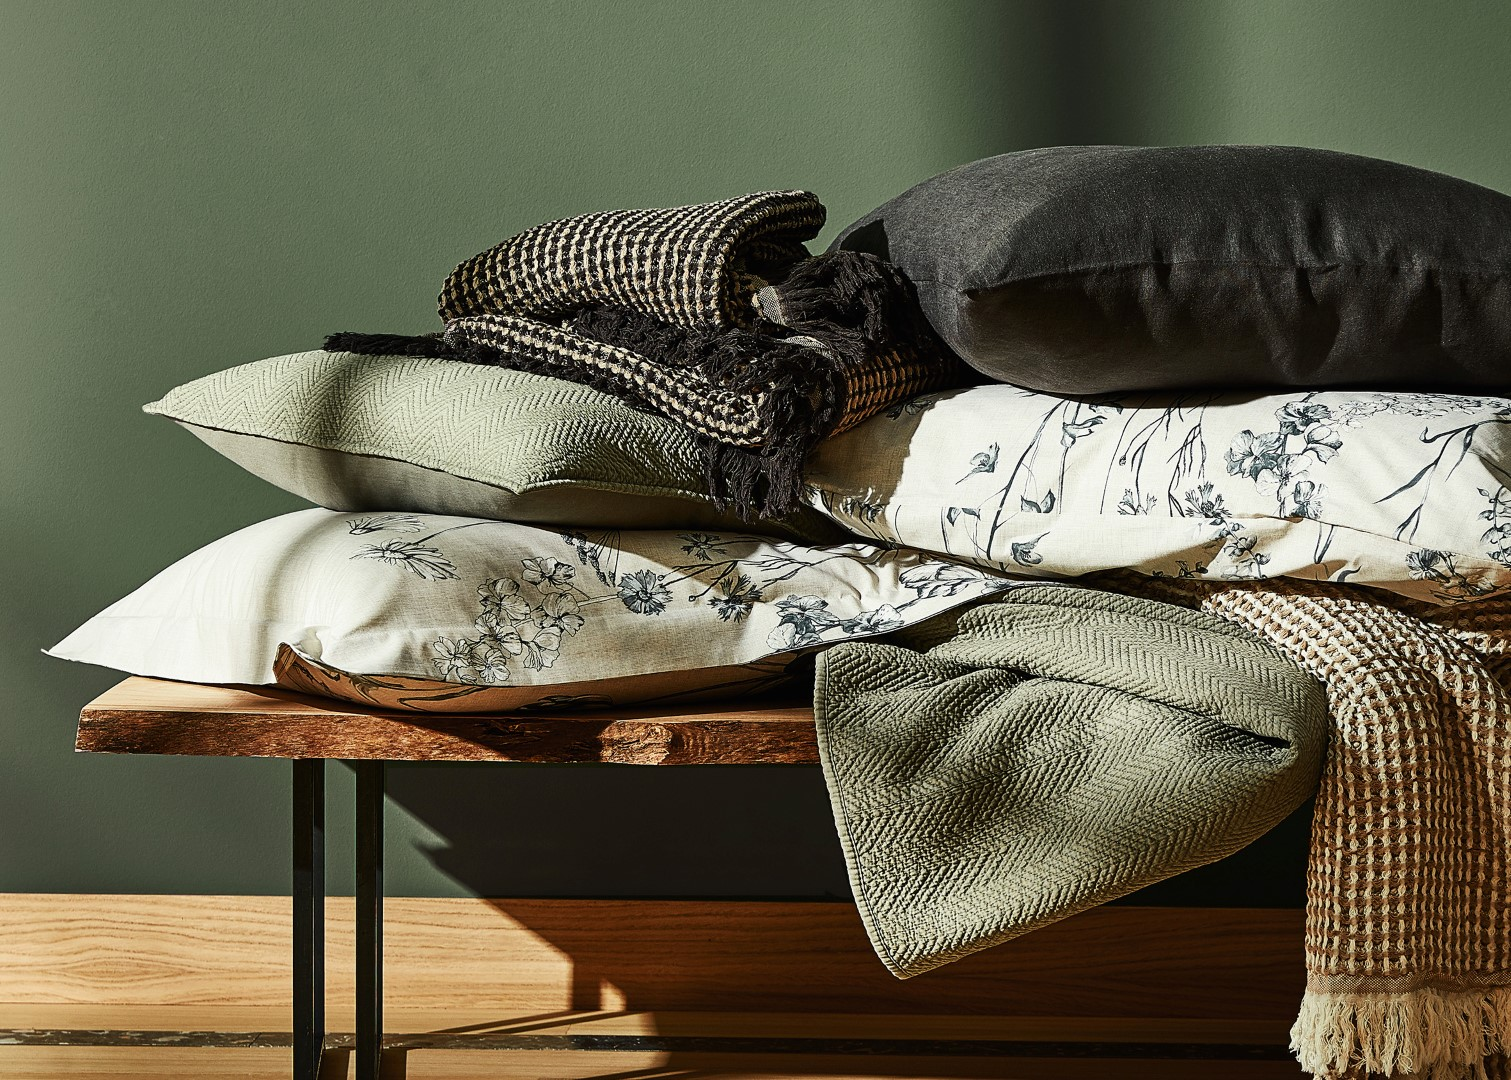 5db4161556a Η νέα συλλογή Zara Home είναι πραγματικά «ονειρεμένη»!   Cool Home